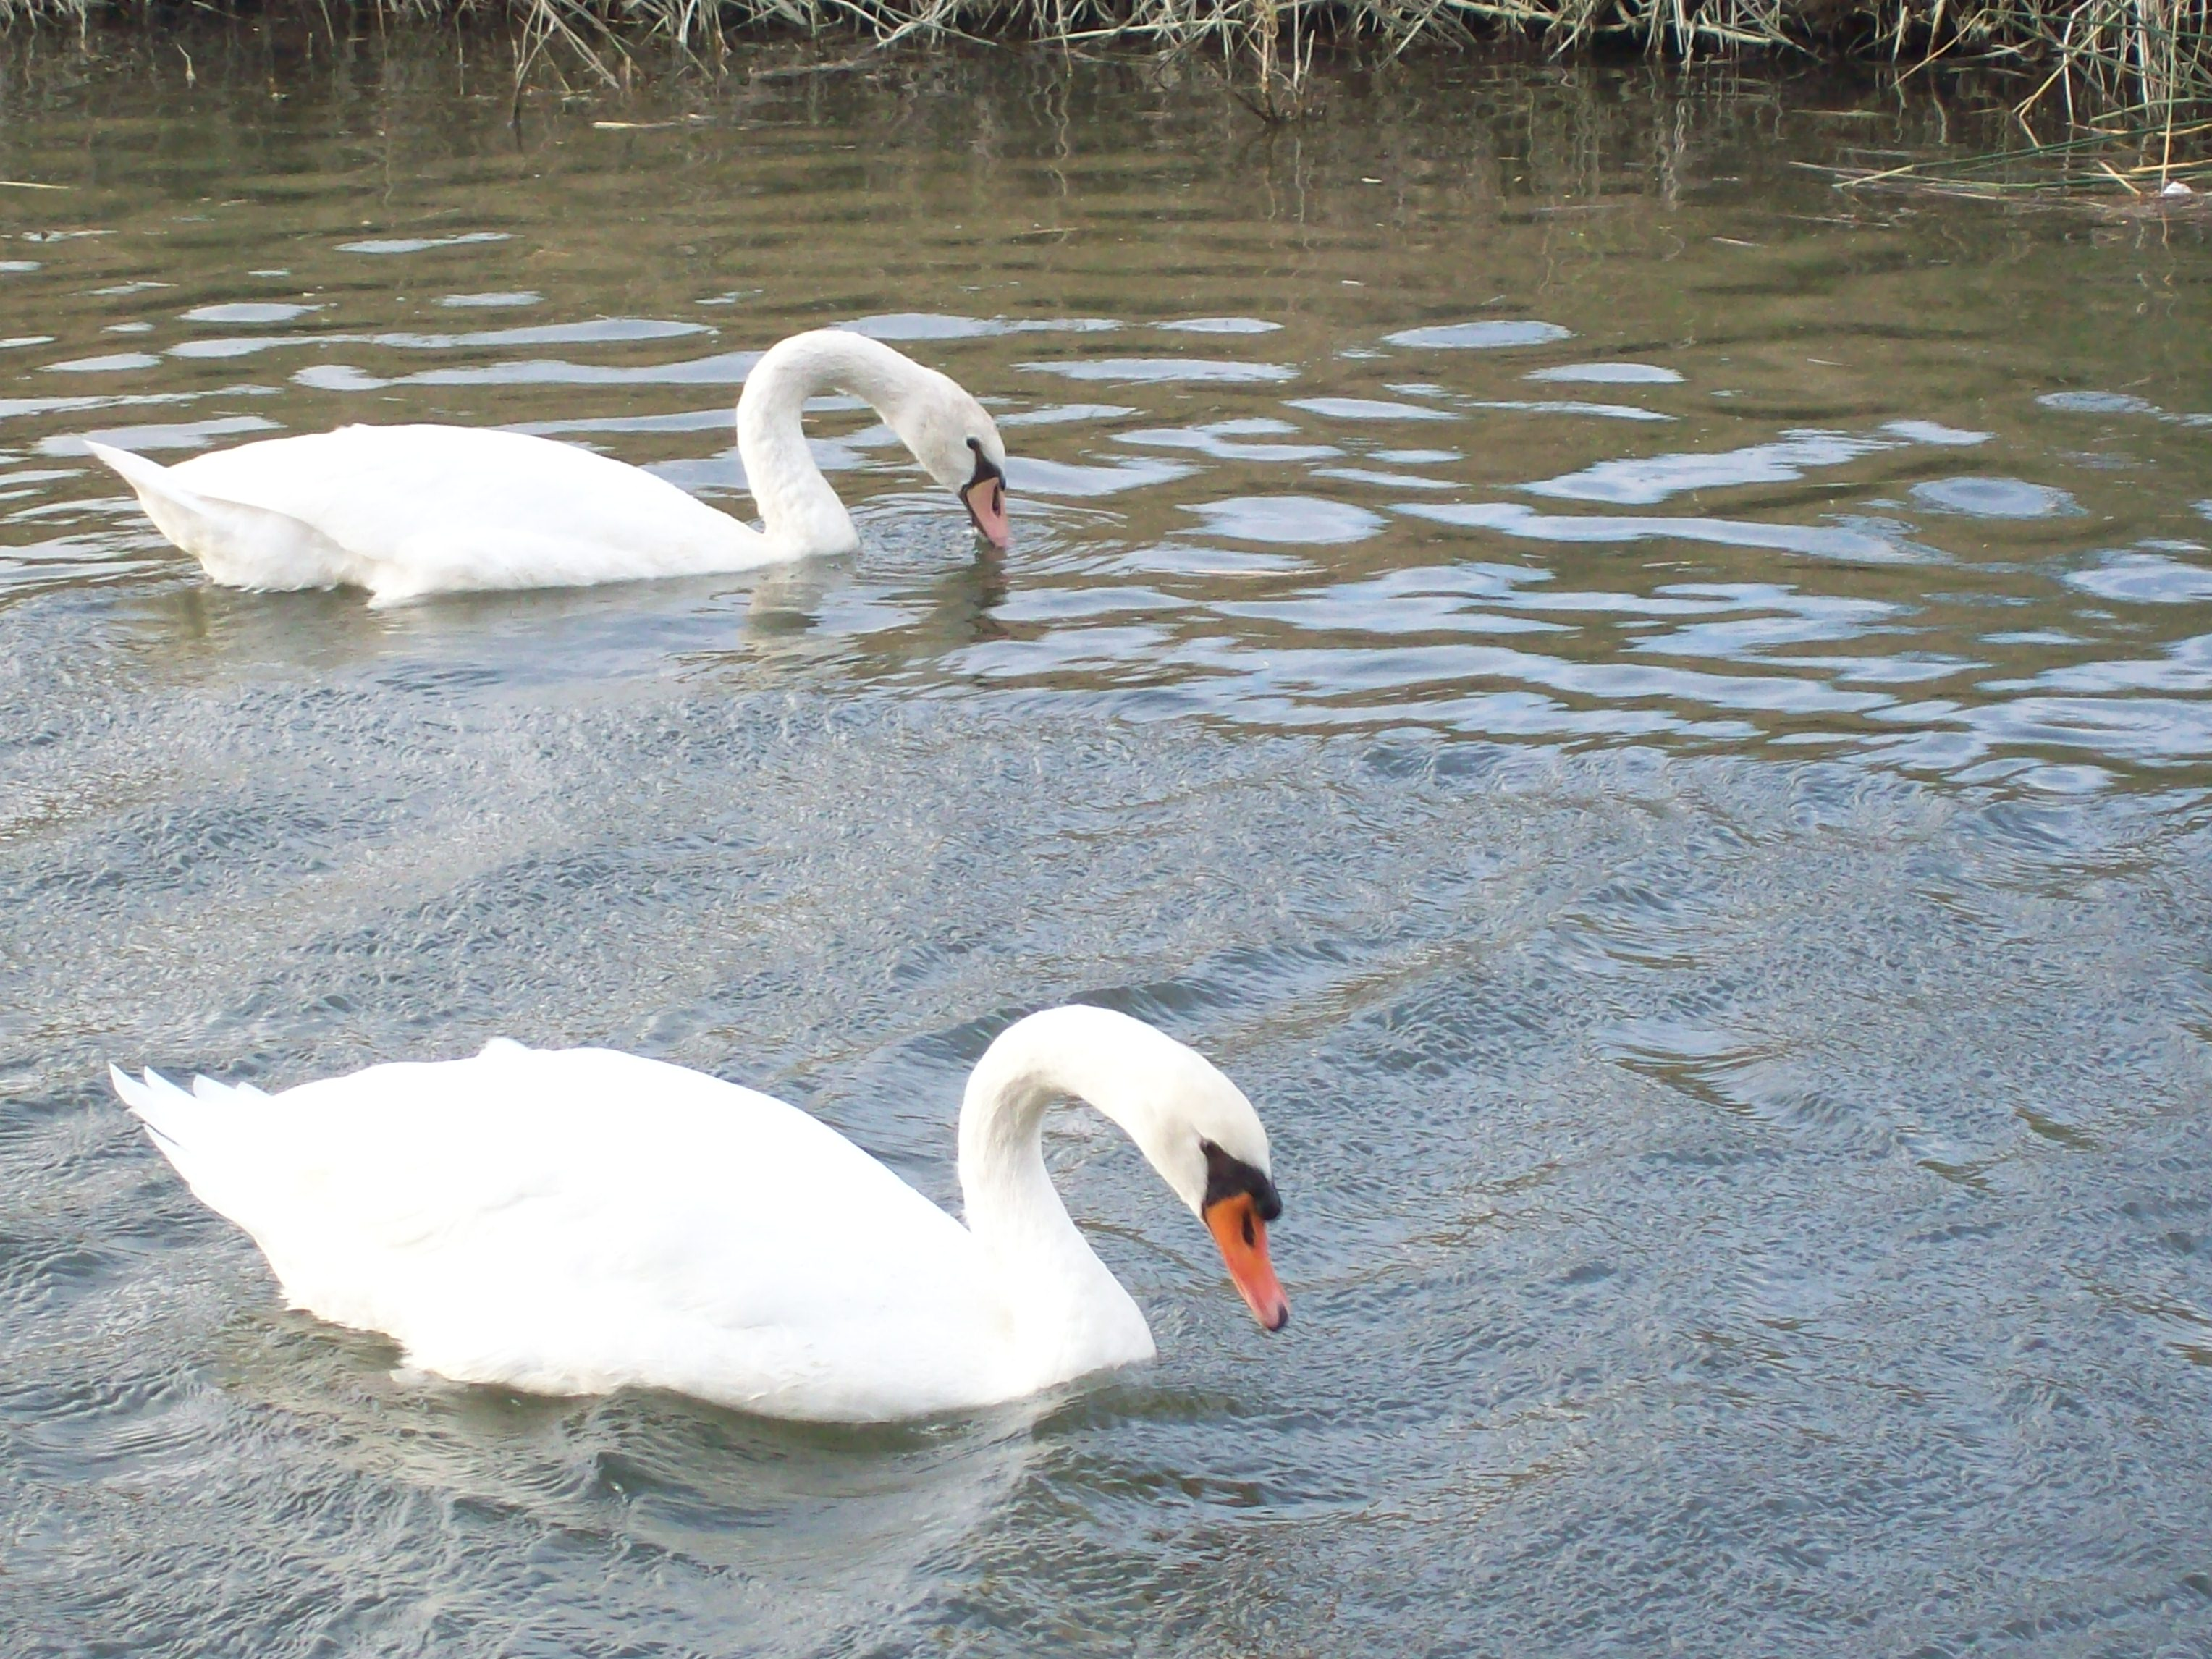 Two swans, Bird, Swan, White, HQ Photo